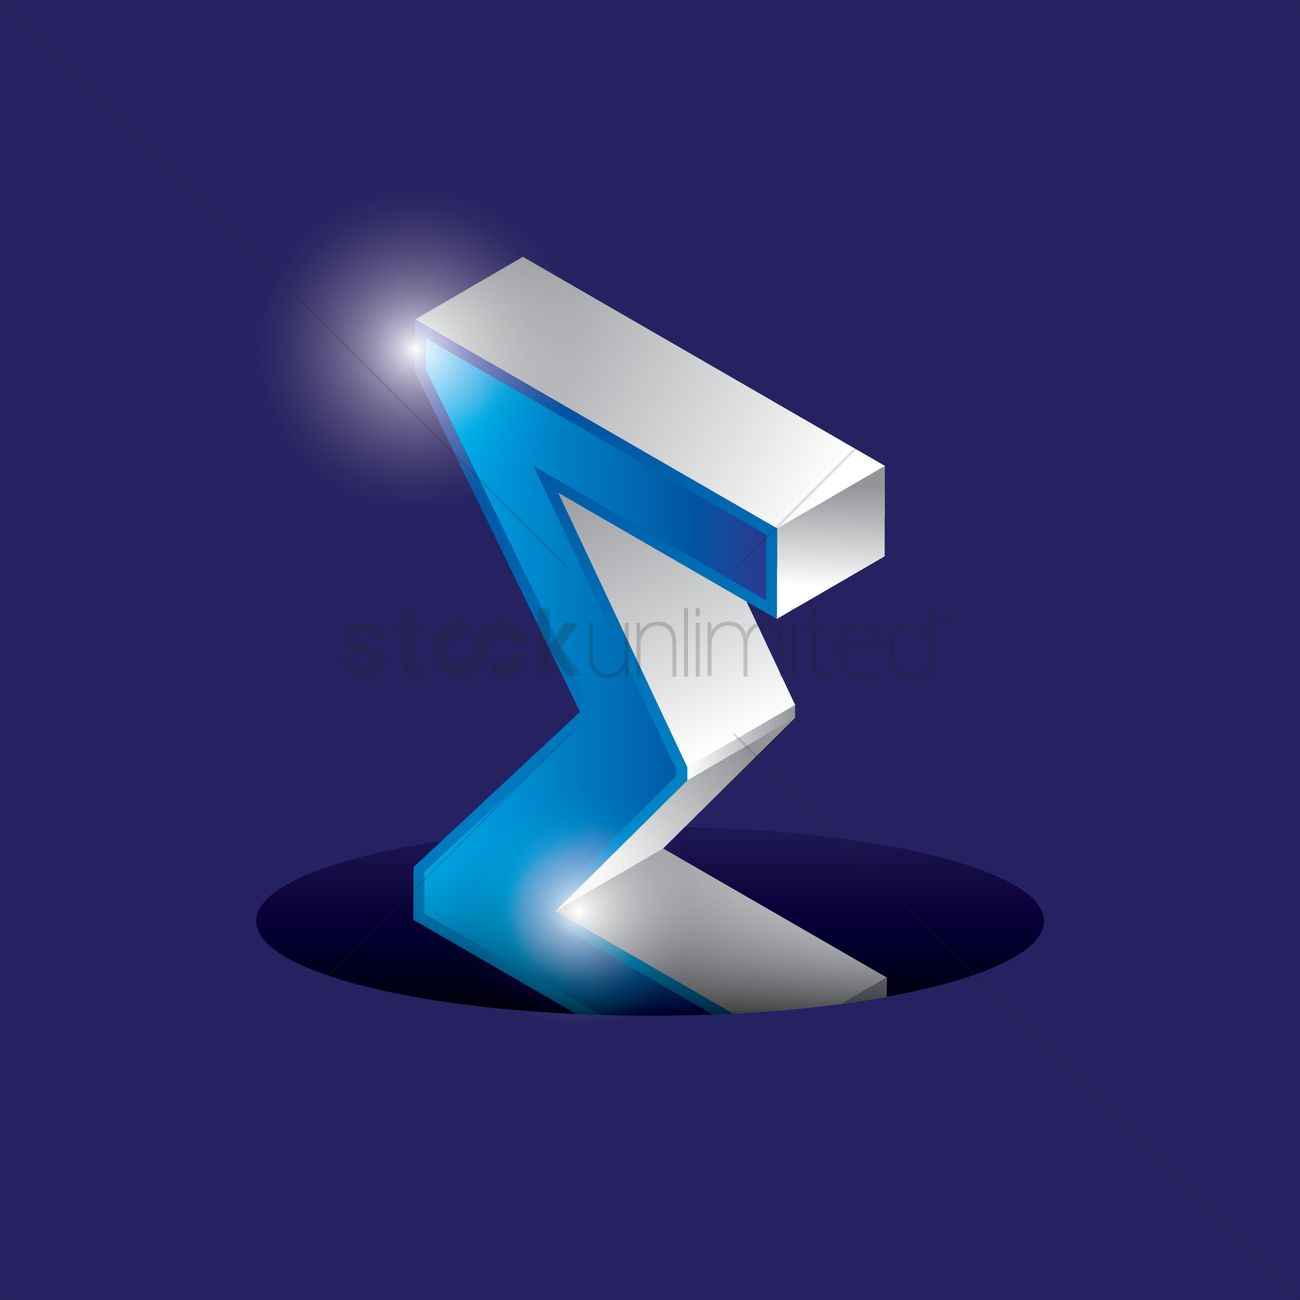 Math sigma symbol gallery symbol and sign ideas sigma symbol vector image 1631150 stockunlimited sigma symbol vector graphic buycottarizona buycottarizona